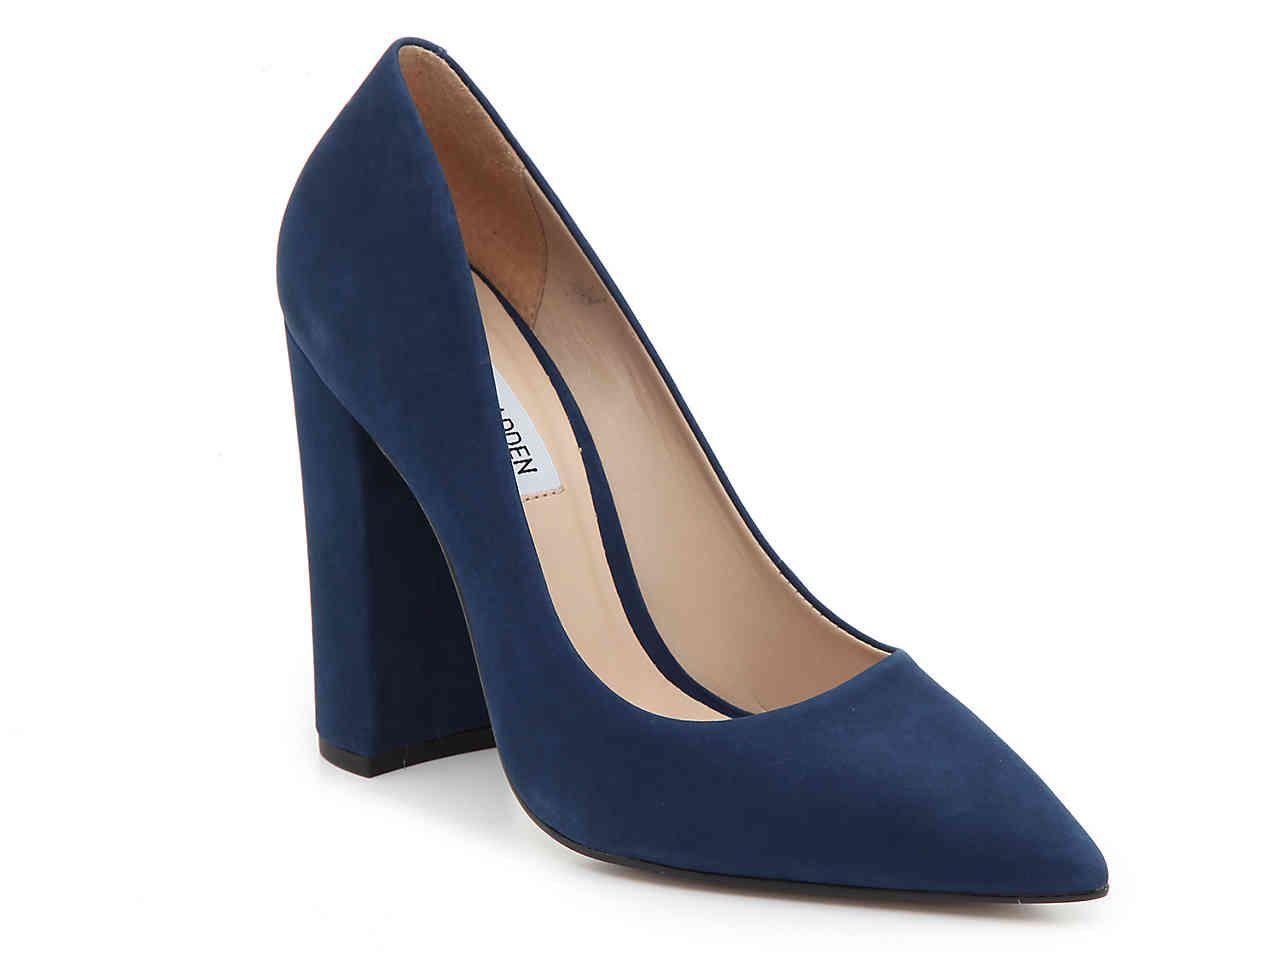 5d723c5d07e Steve Madden Prance Pump | DSW | Finishing Touches | Shoes, Girls ...